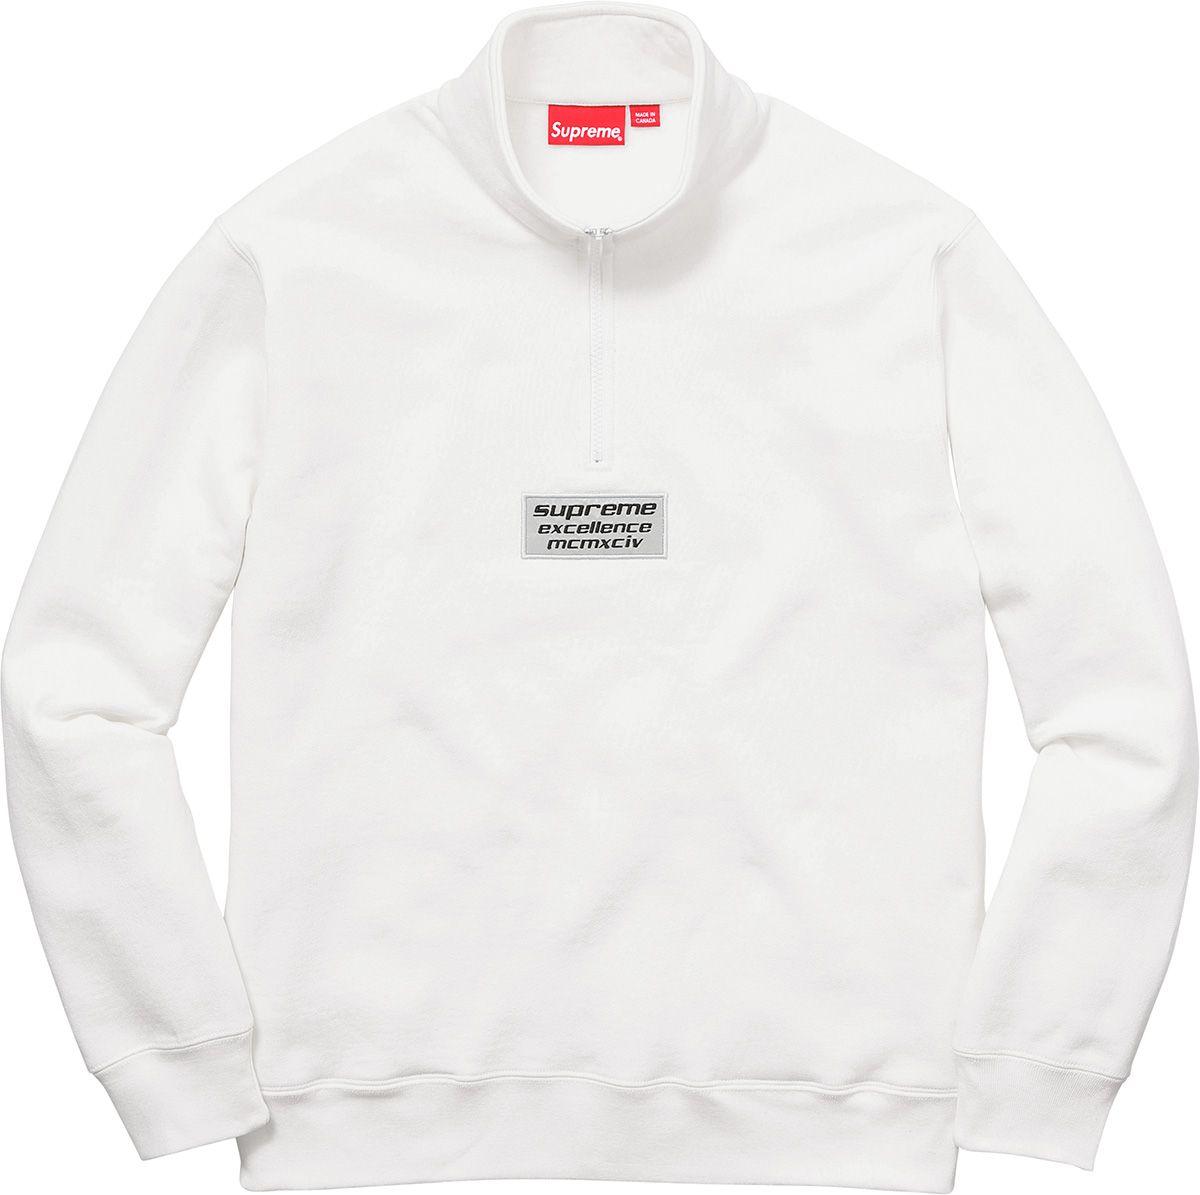 Supreme Stripe Hooded Sweatshirt Hooded Sweatshirts Sweatshirts T Shirts S [ 1195 x 1200 Pixel ]